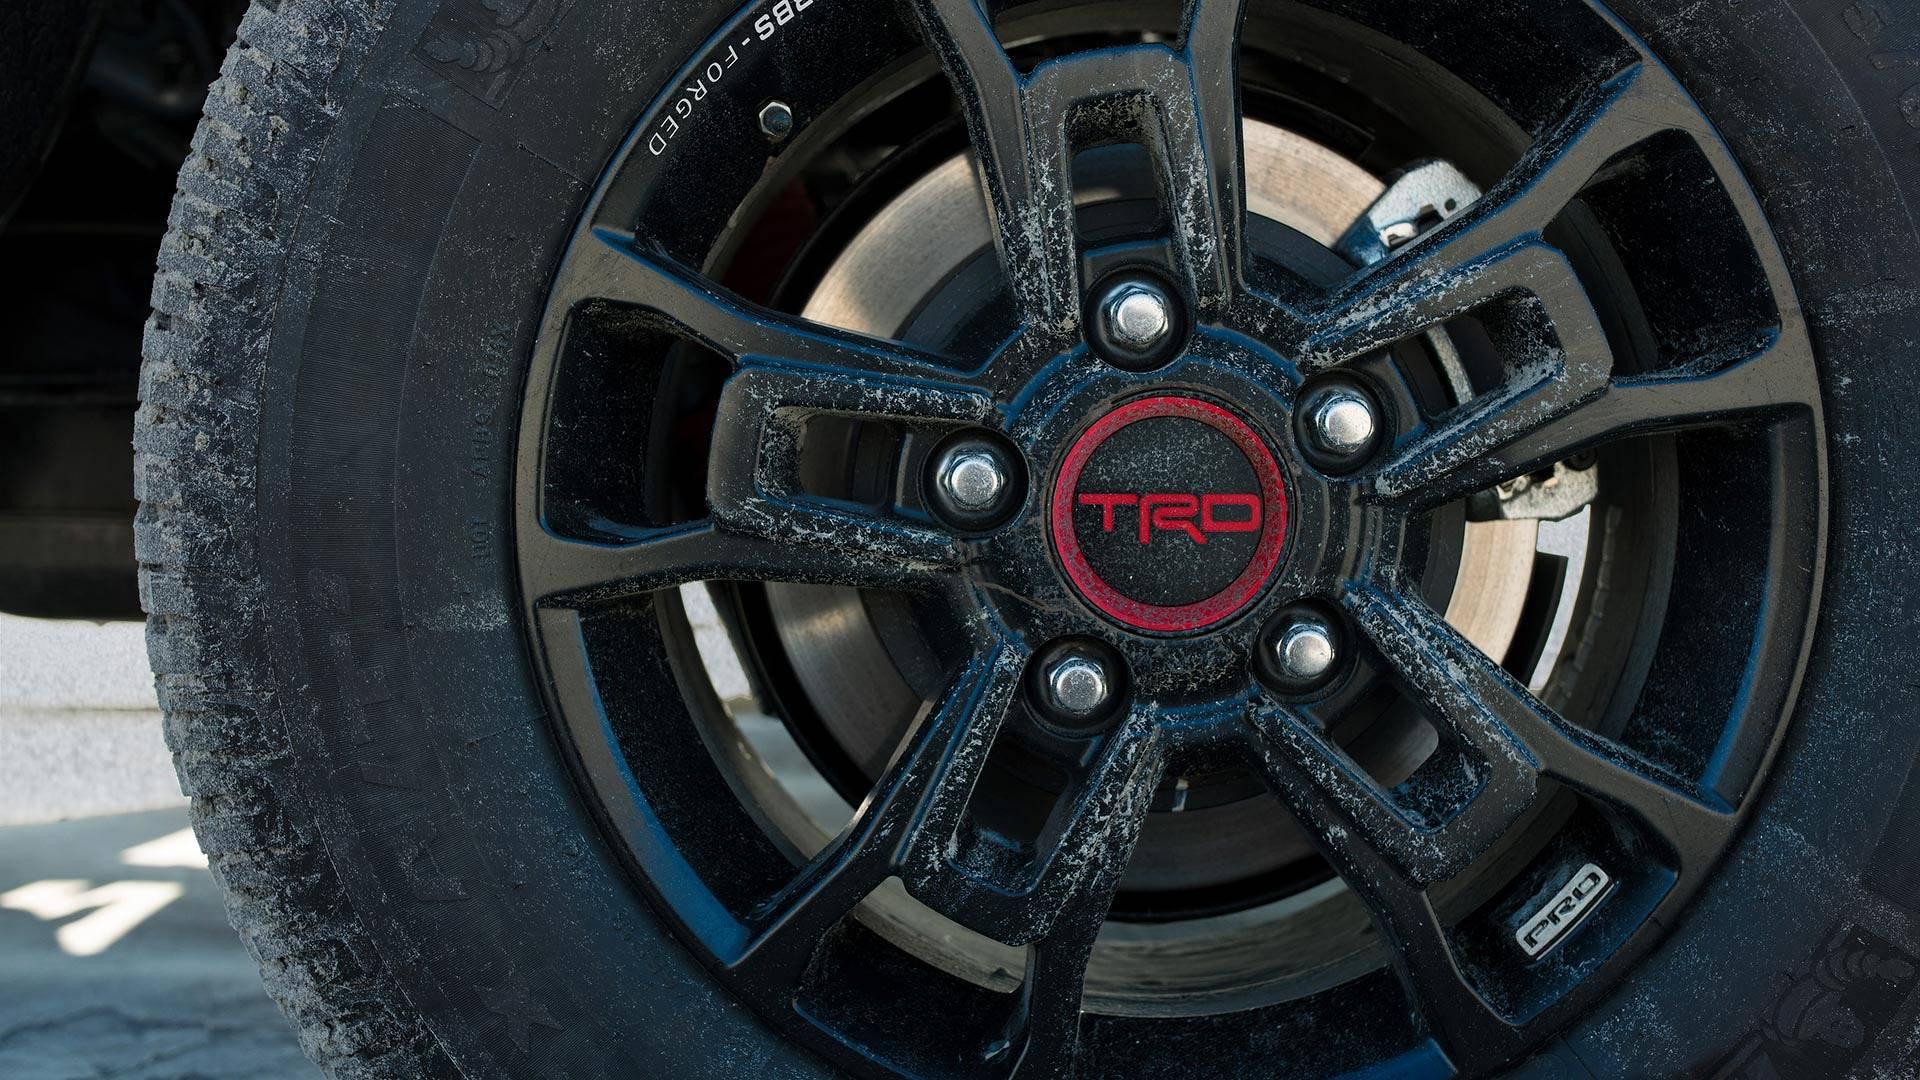 2019-toyota-tundra-trd-pro (3)